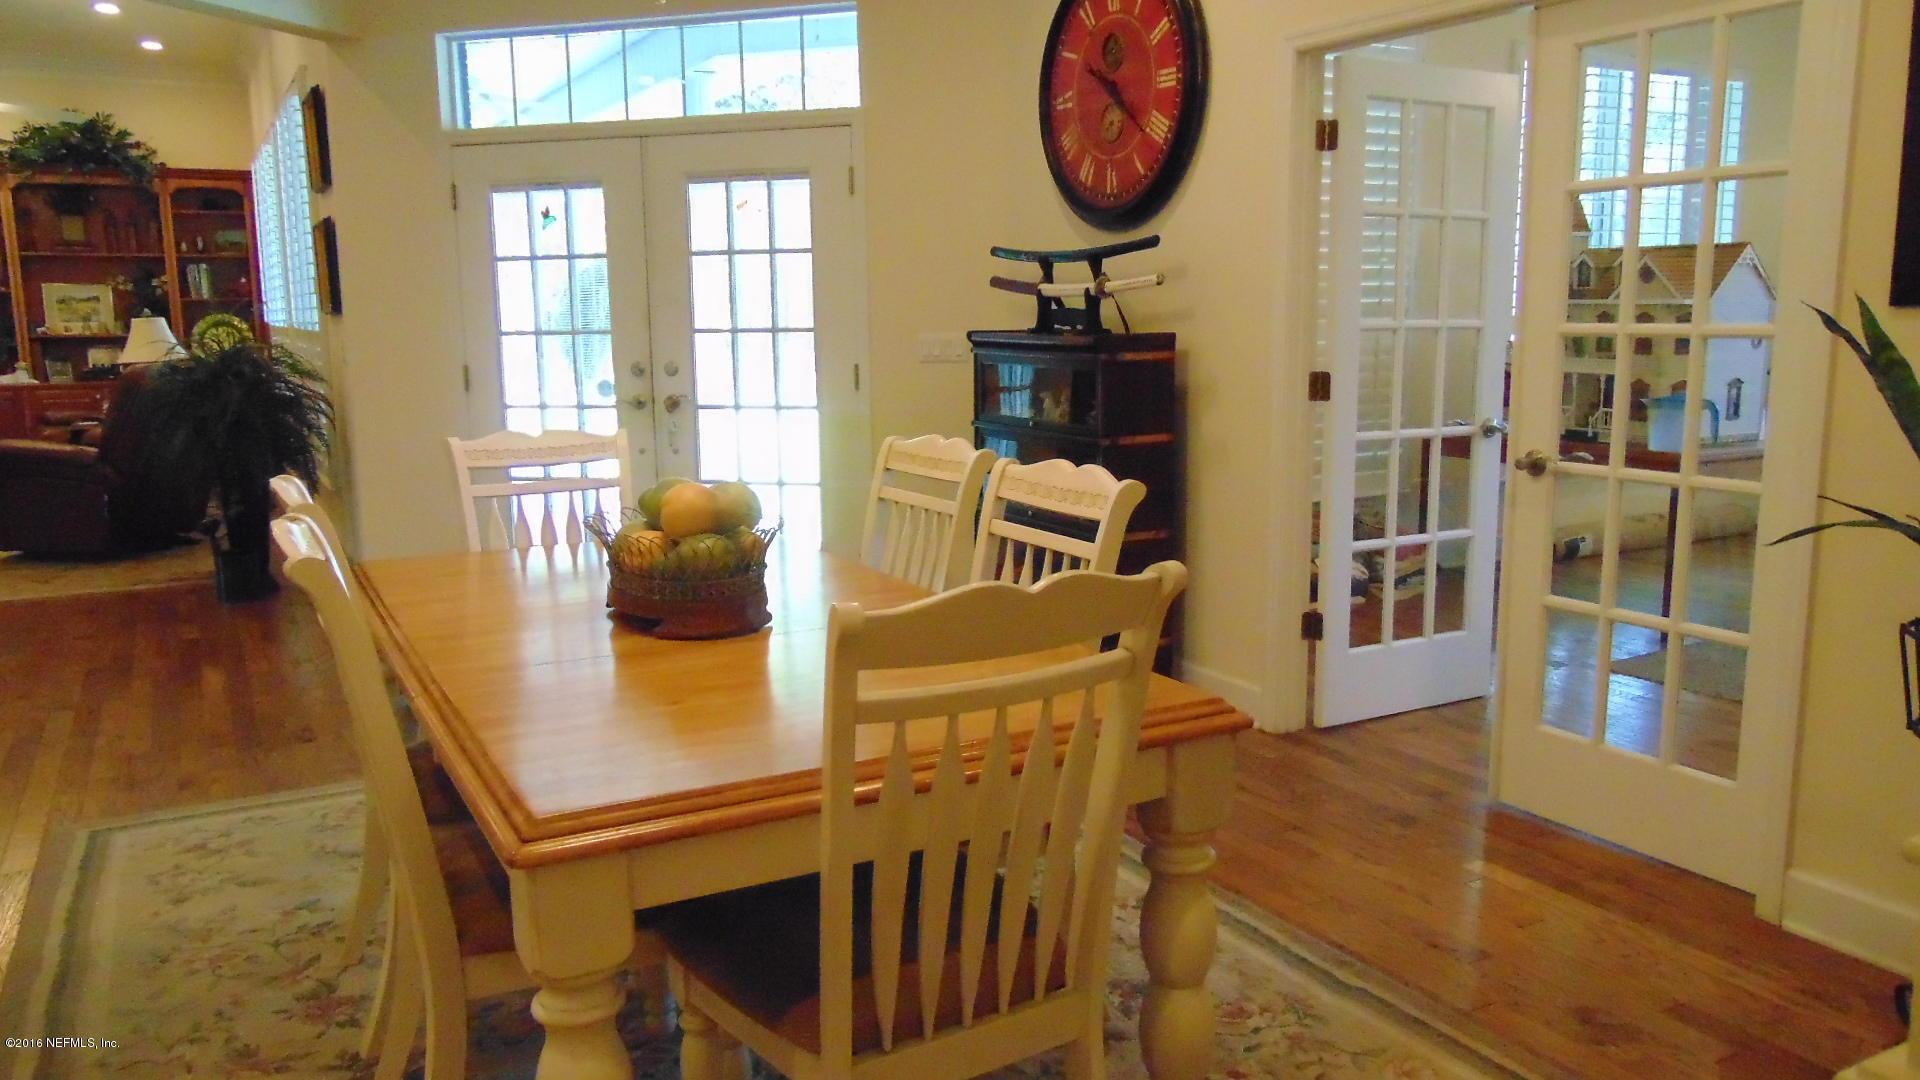 8140 NO ROAD, MACCLENNY, FLORIDA 32063-7526, 5 Bedrooms Bedrooms, ,6 BathroomsBathrooms,Residential - single family,For sale,NO ROAD,840424